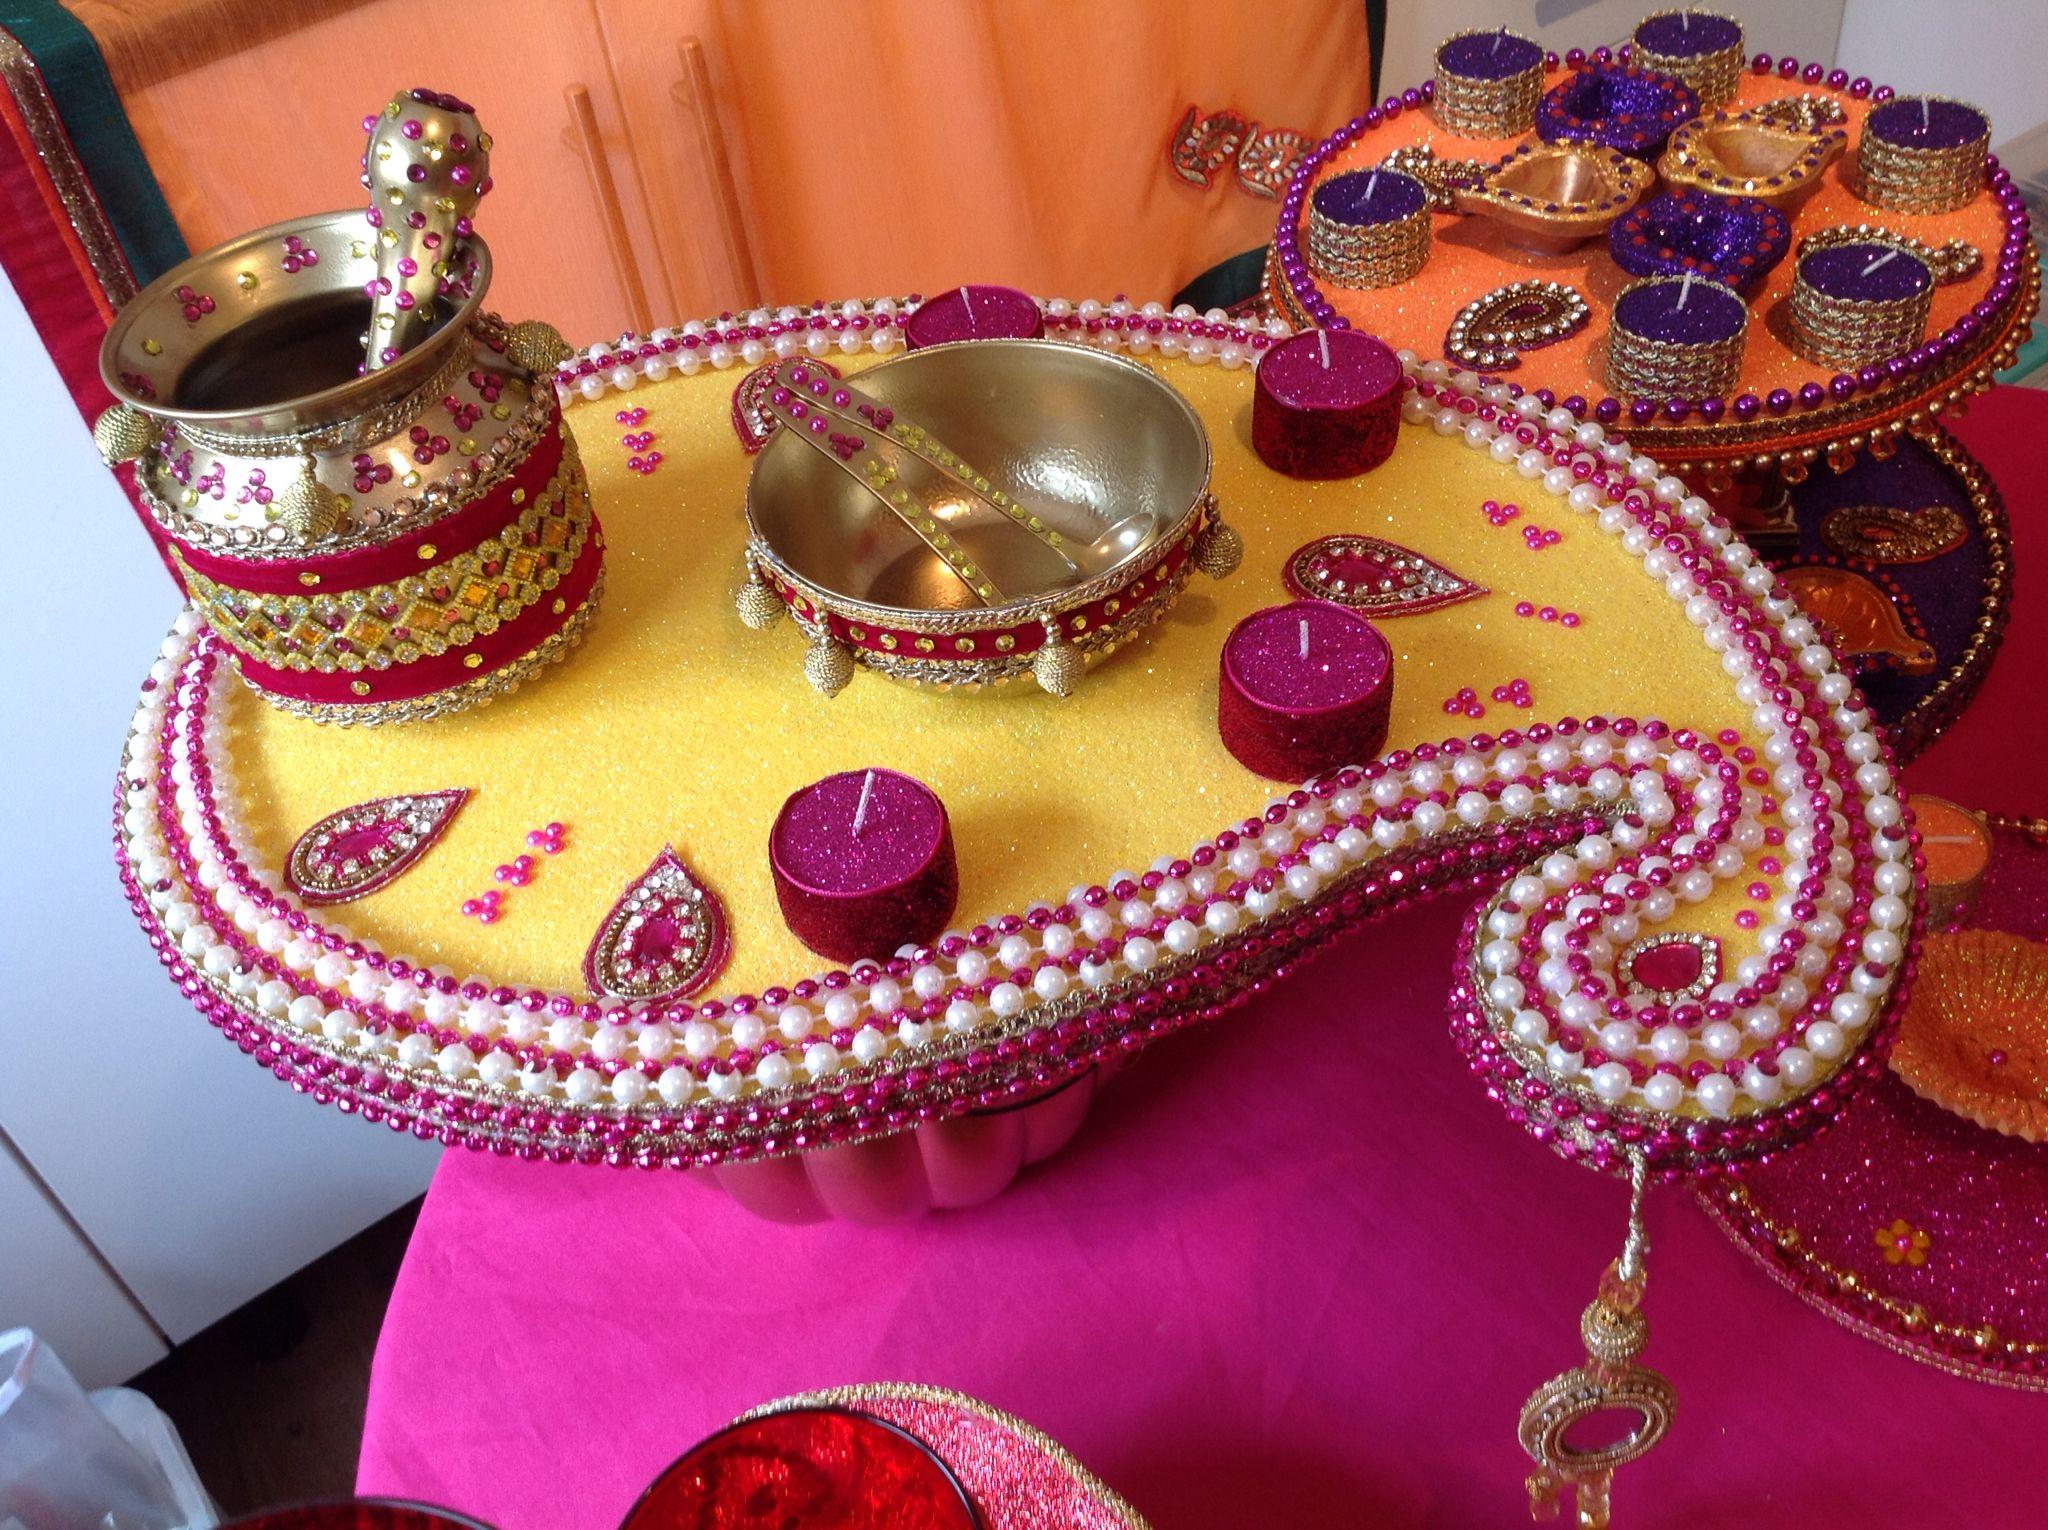 Diy Mehndi Plates : Beautiful large paisley mehndi plate see my facebook page